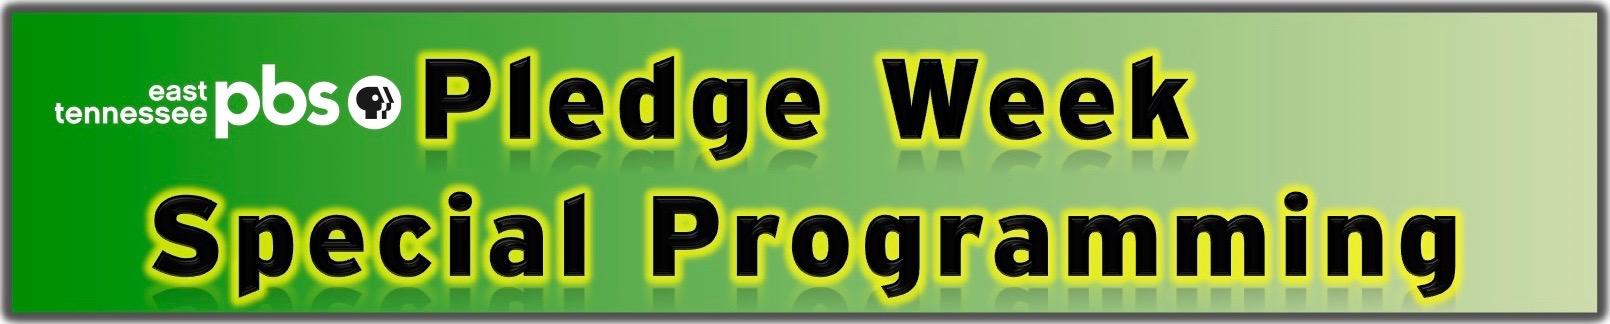 Pledge Week Main Page Banner.jpg